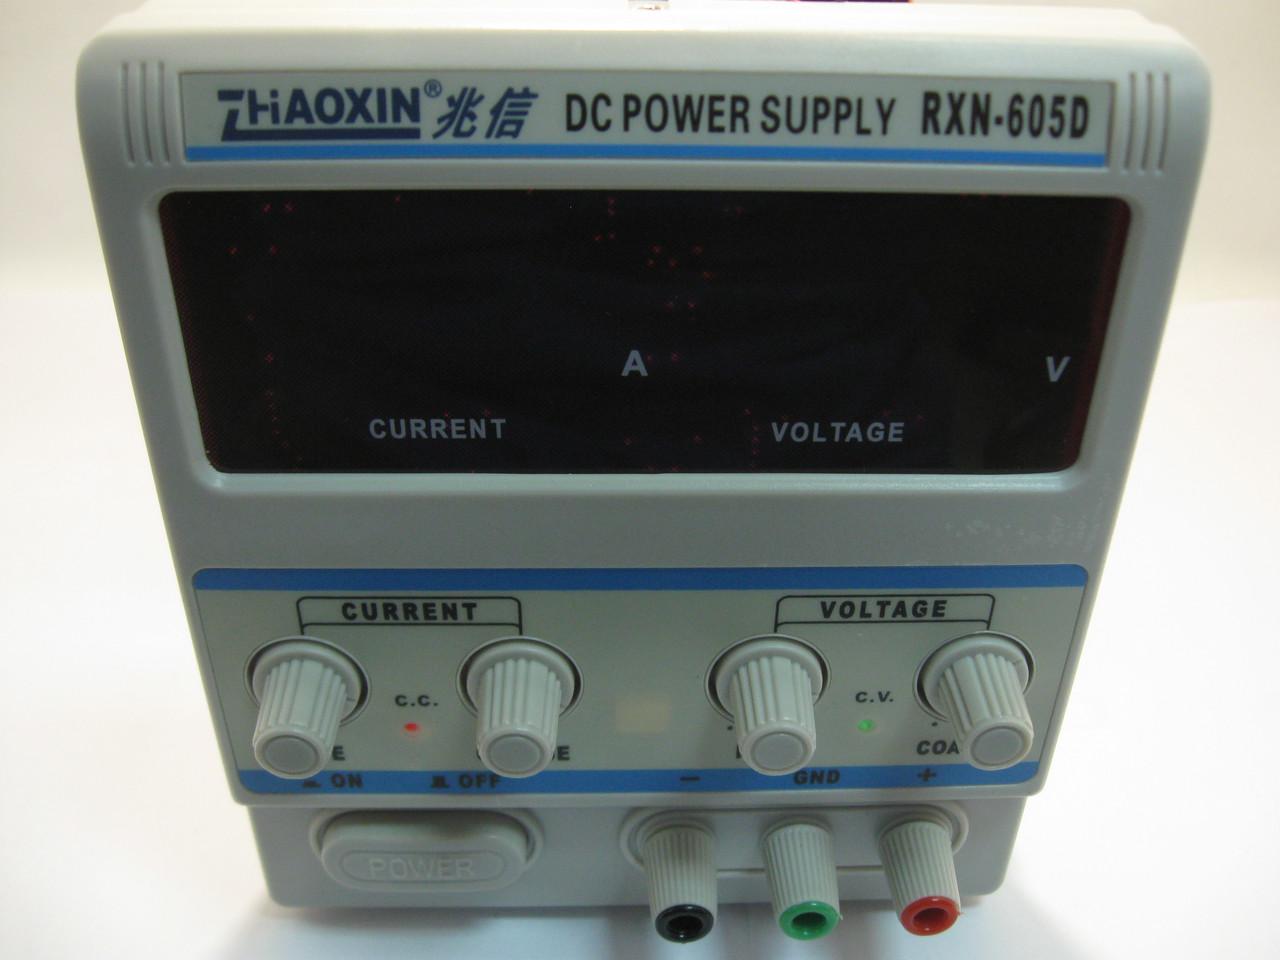 Лабораторный блок питания Zhaoxin RXN-605D